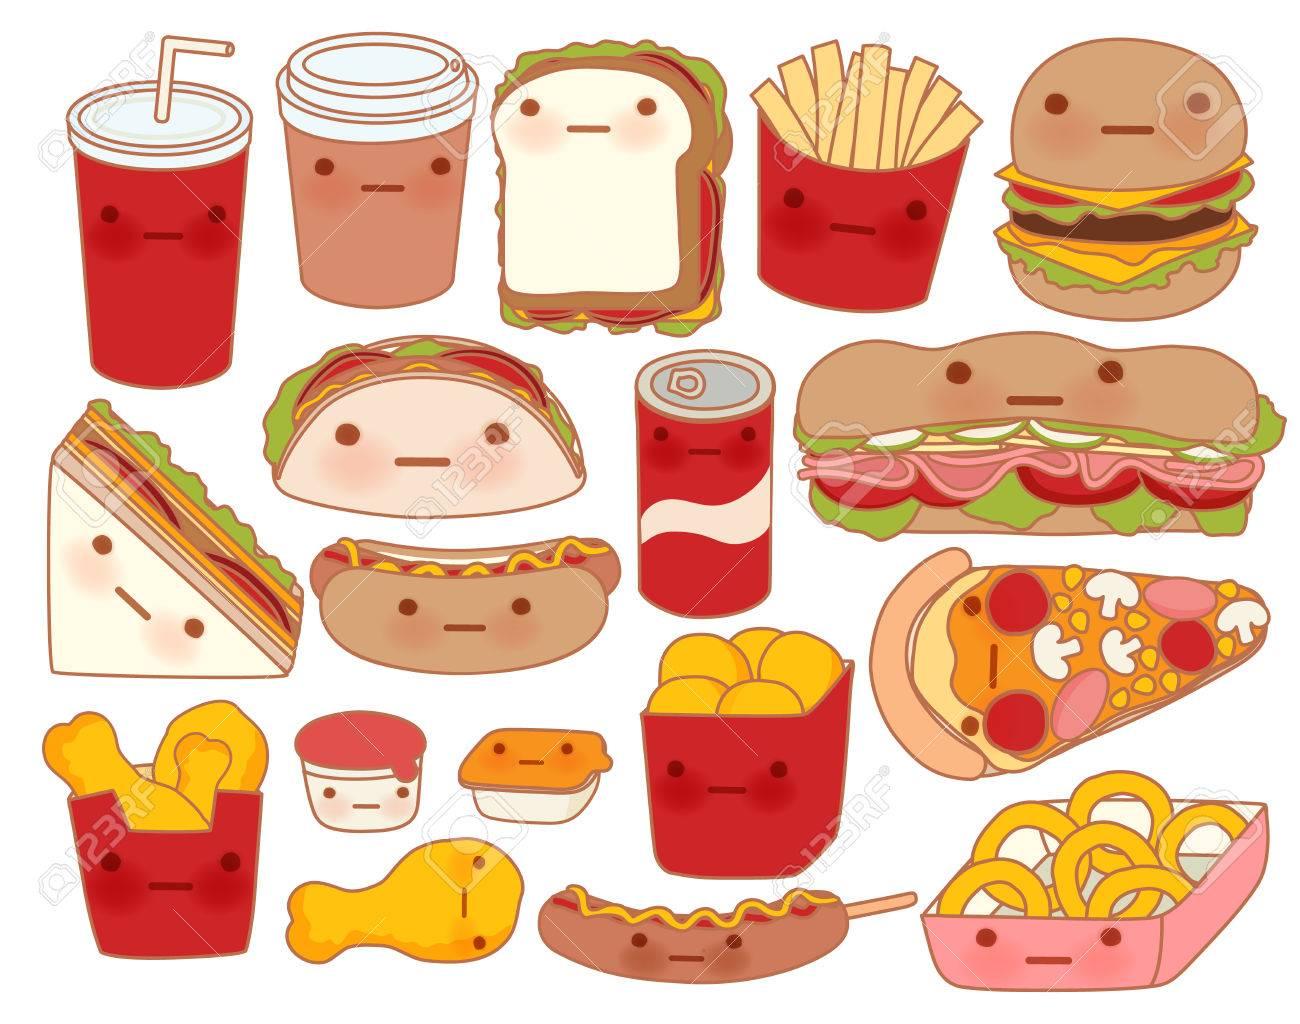 Colección De Icono De Alimentos Para Bebés Preciosa Garabato